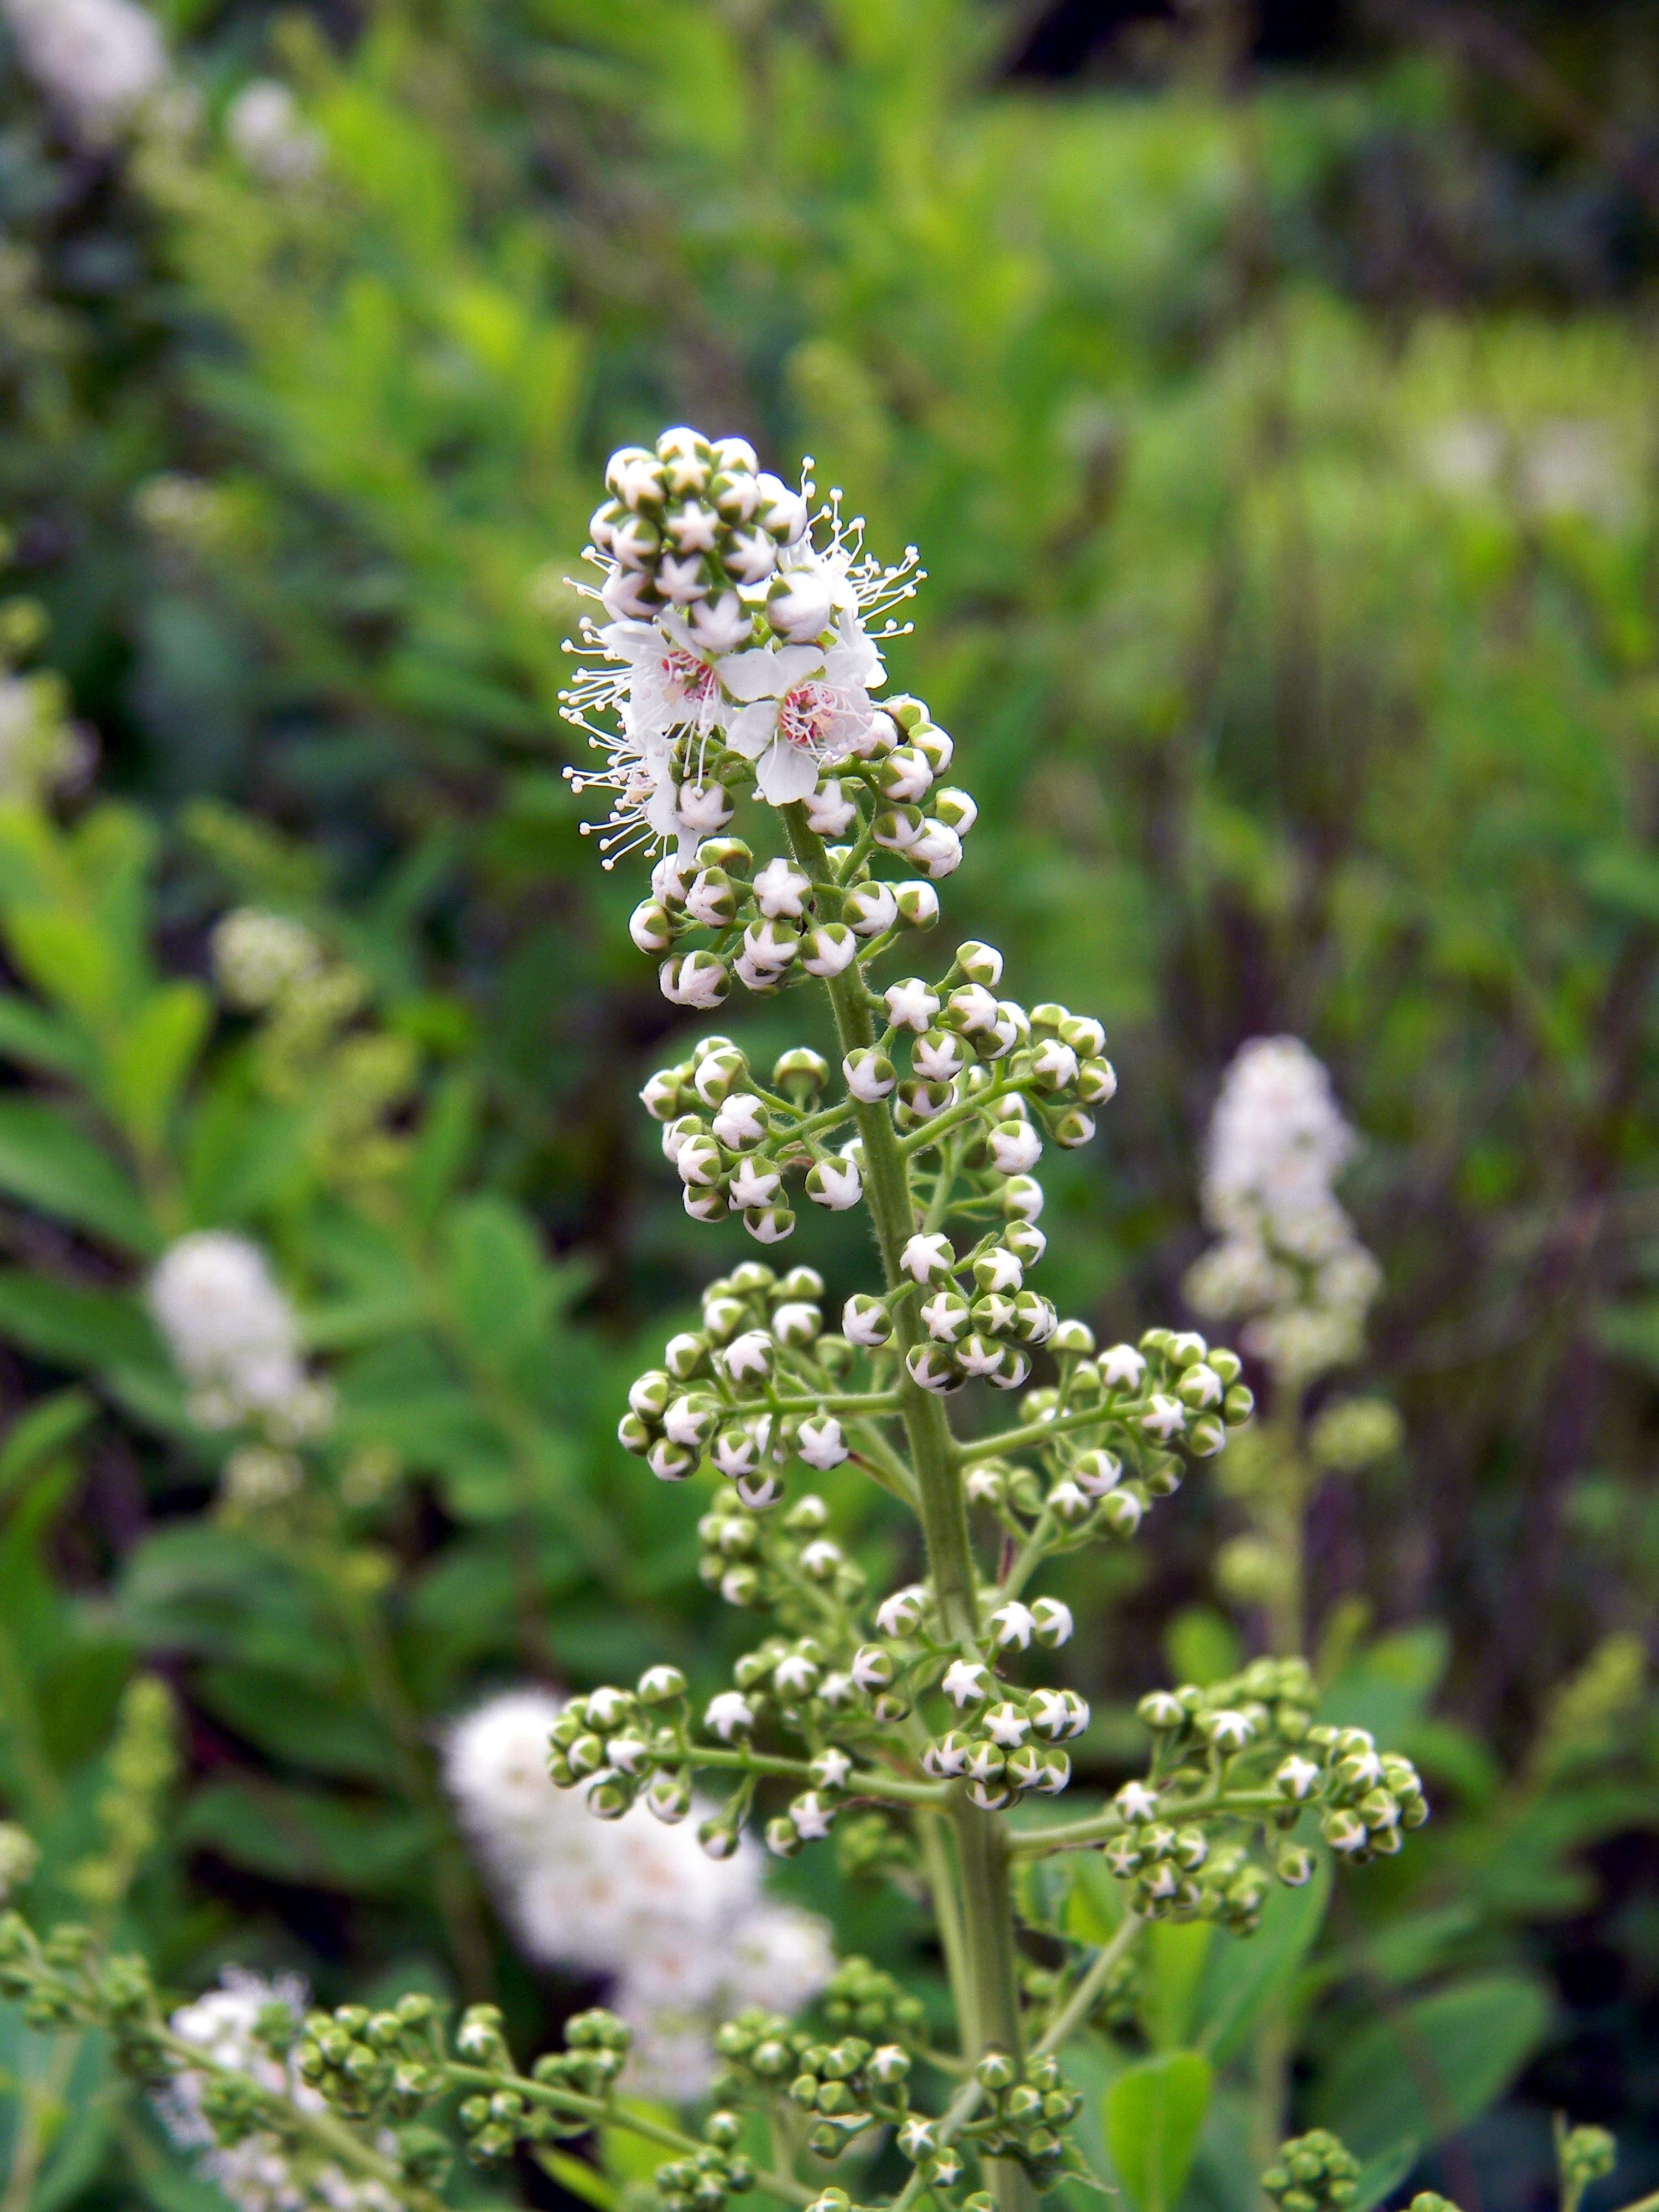 Free Images Nature Flower Bloom Bush Herb Macro Botany